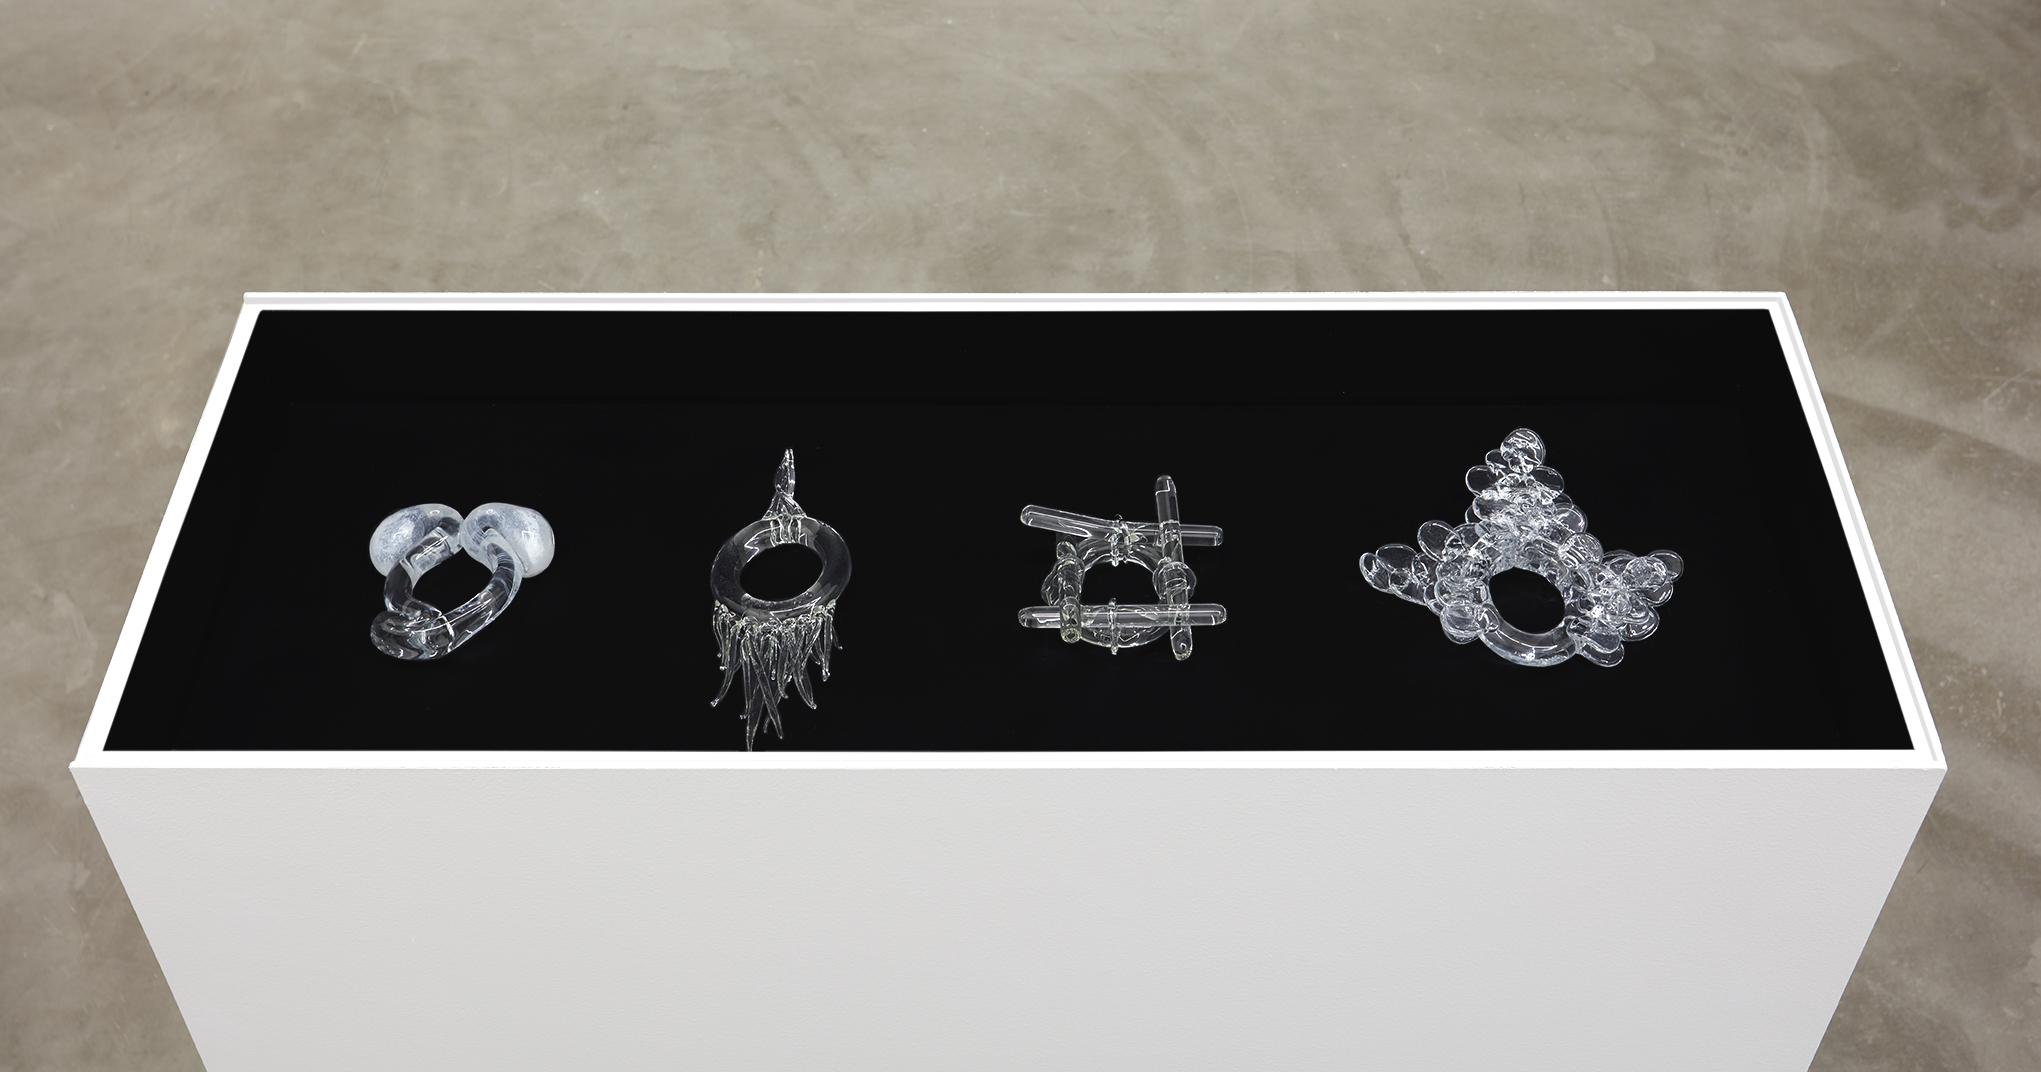 Jean-Luc Verna, Cantillon, Fokine, Galvan, Marie, 2009 glass. 4 individual works variable dimensions